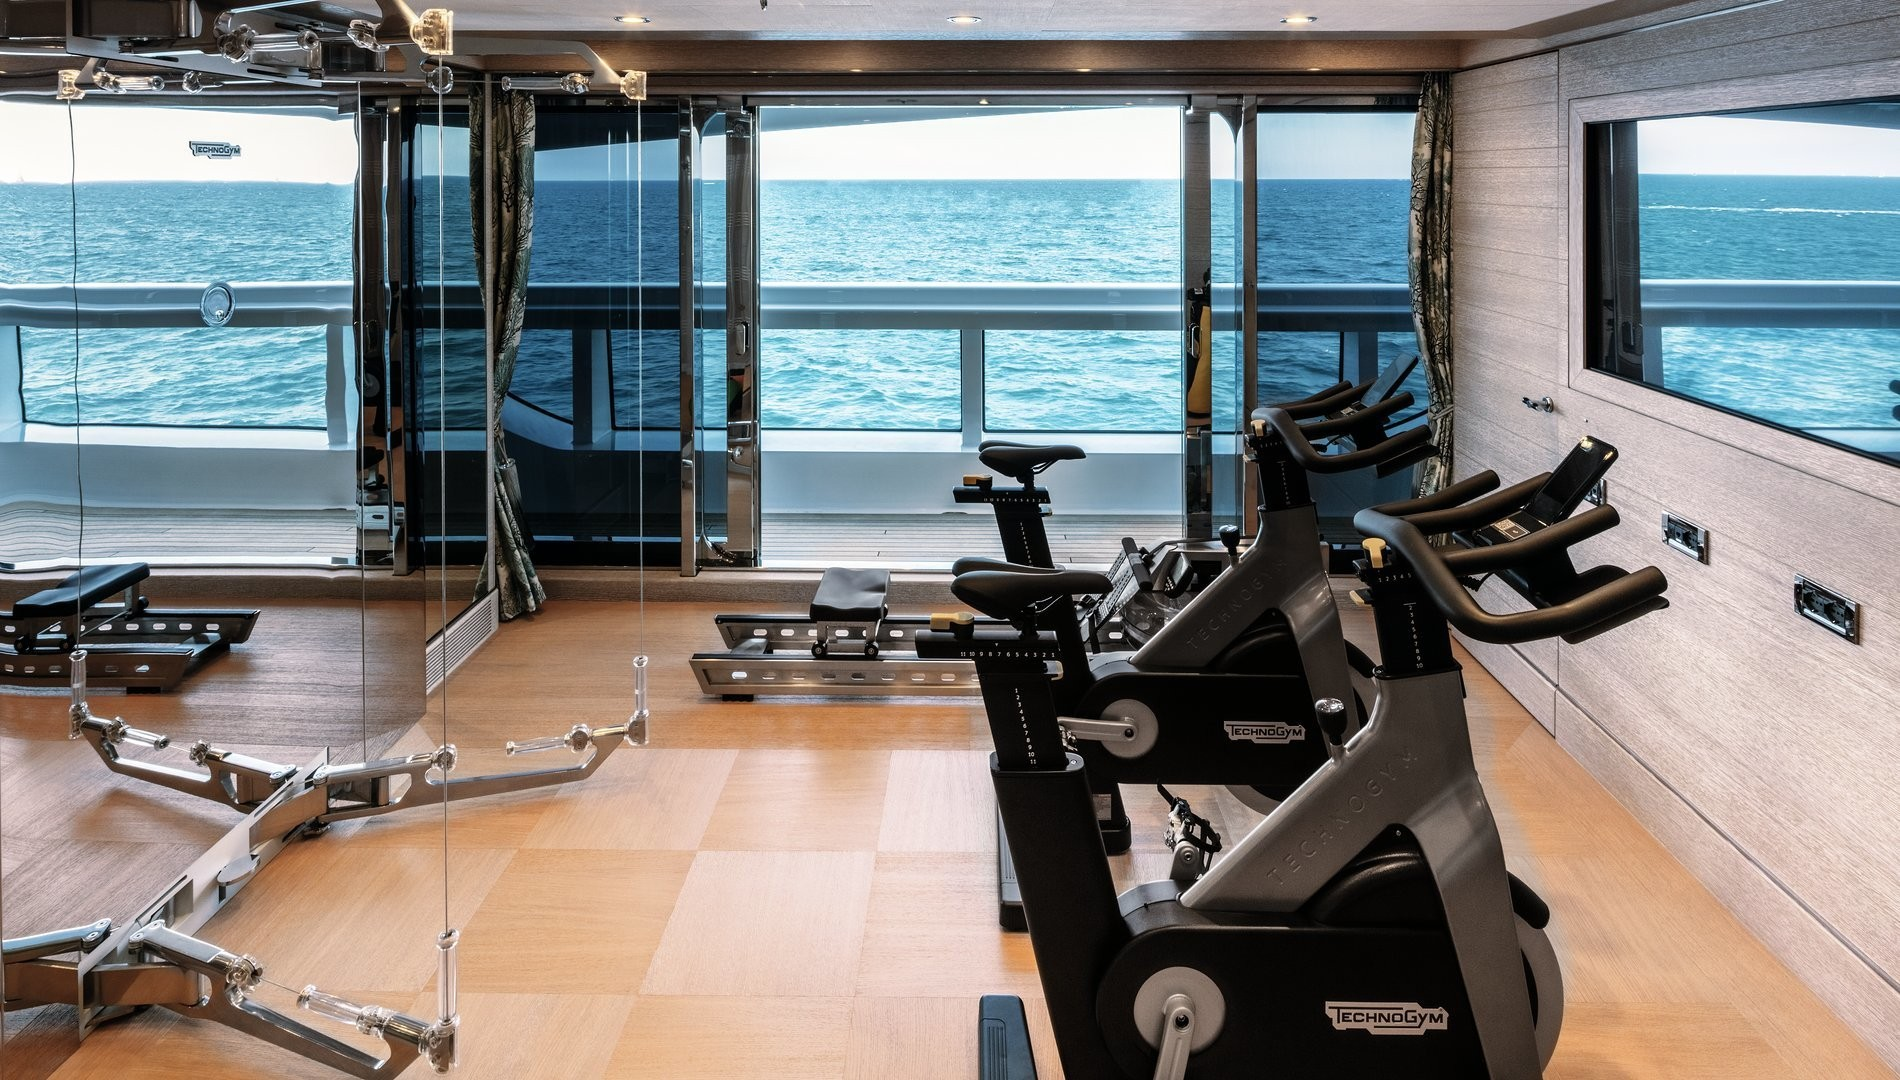 yacht gym equipment